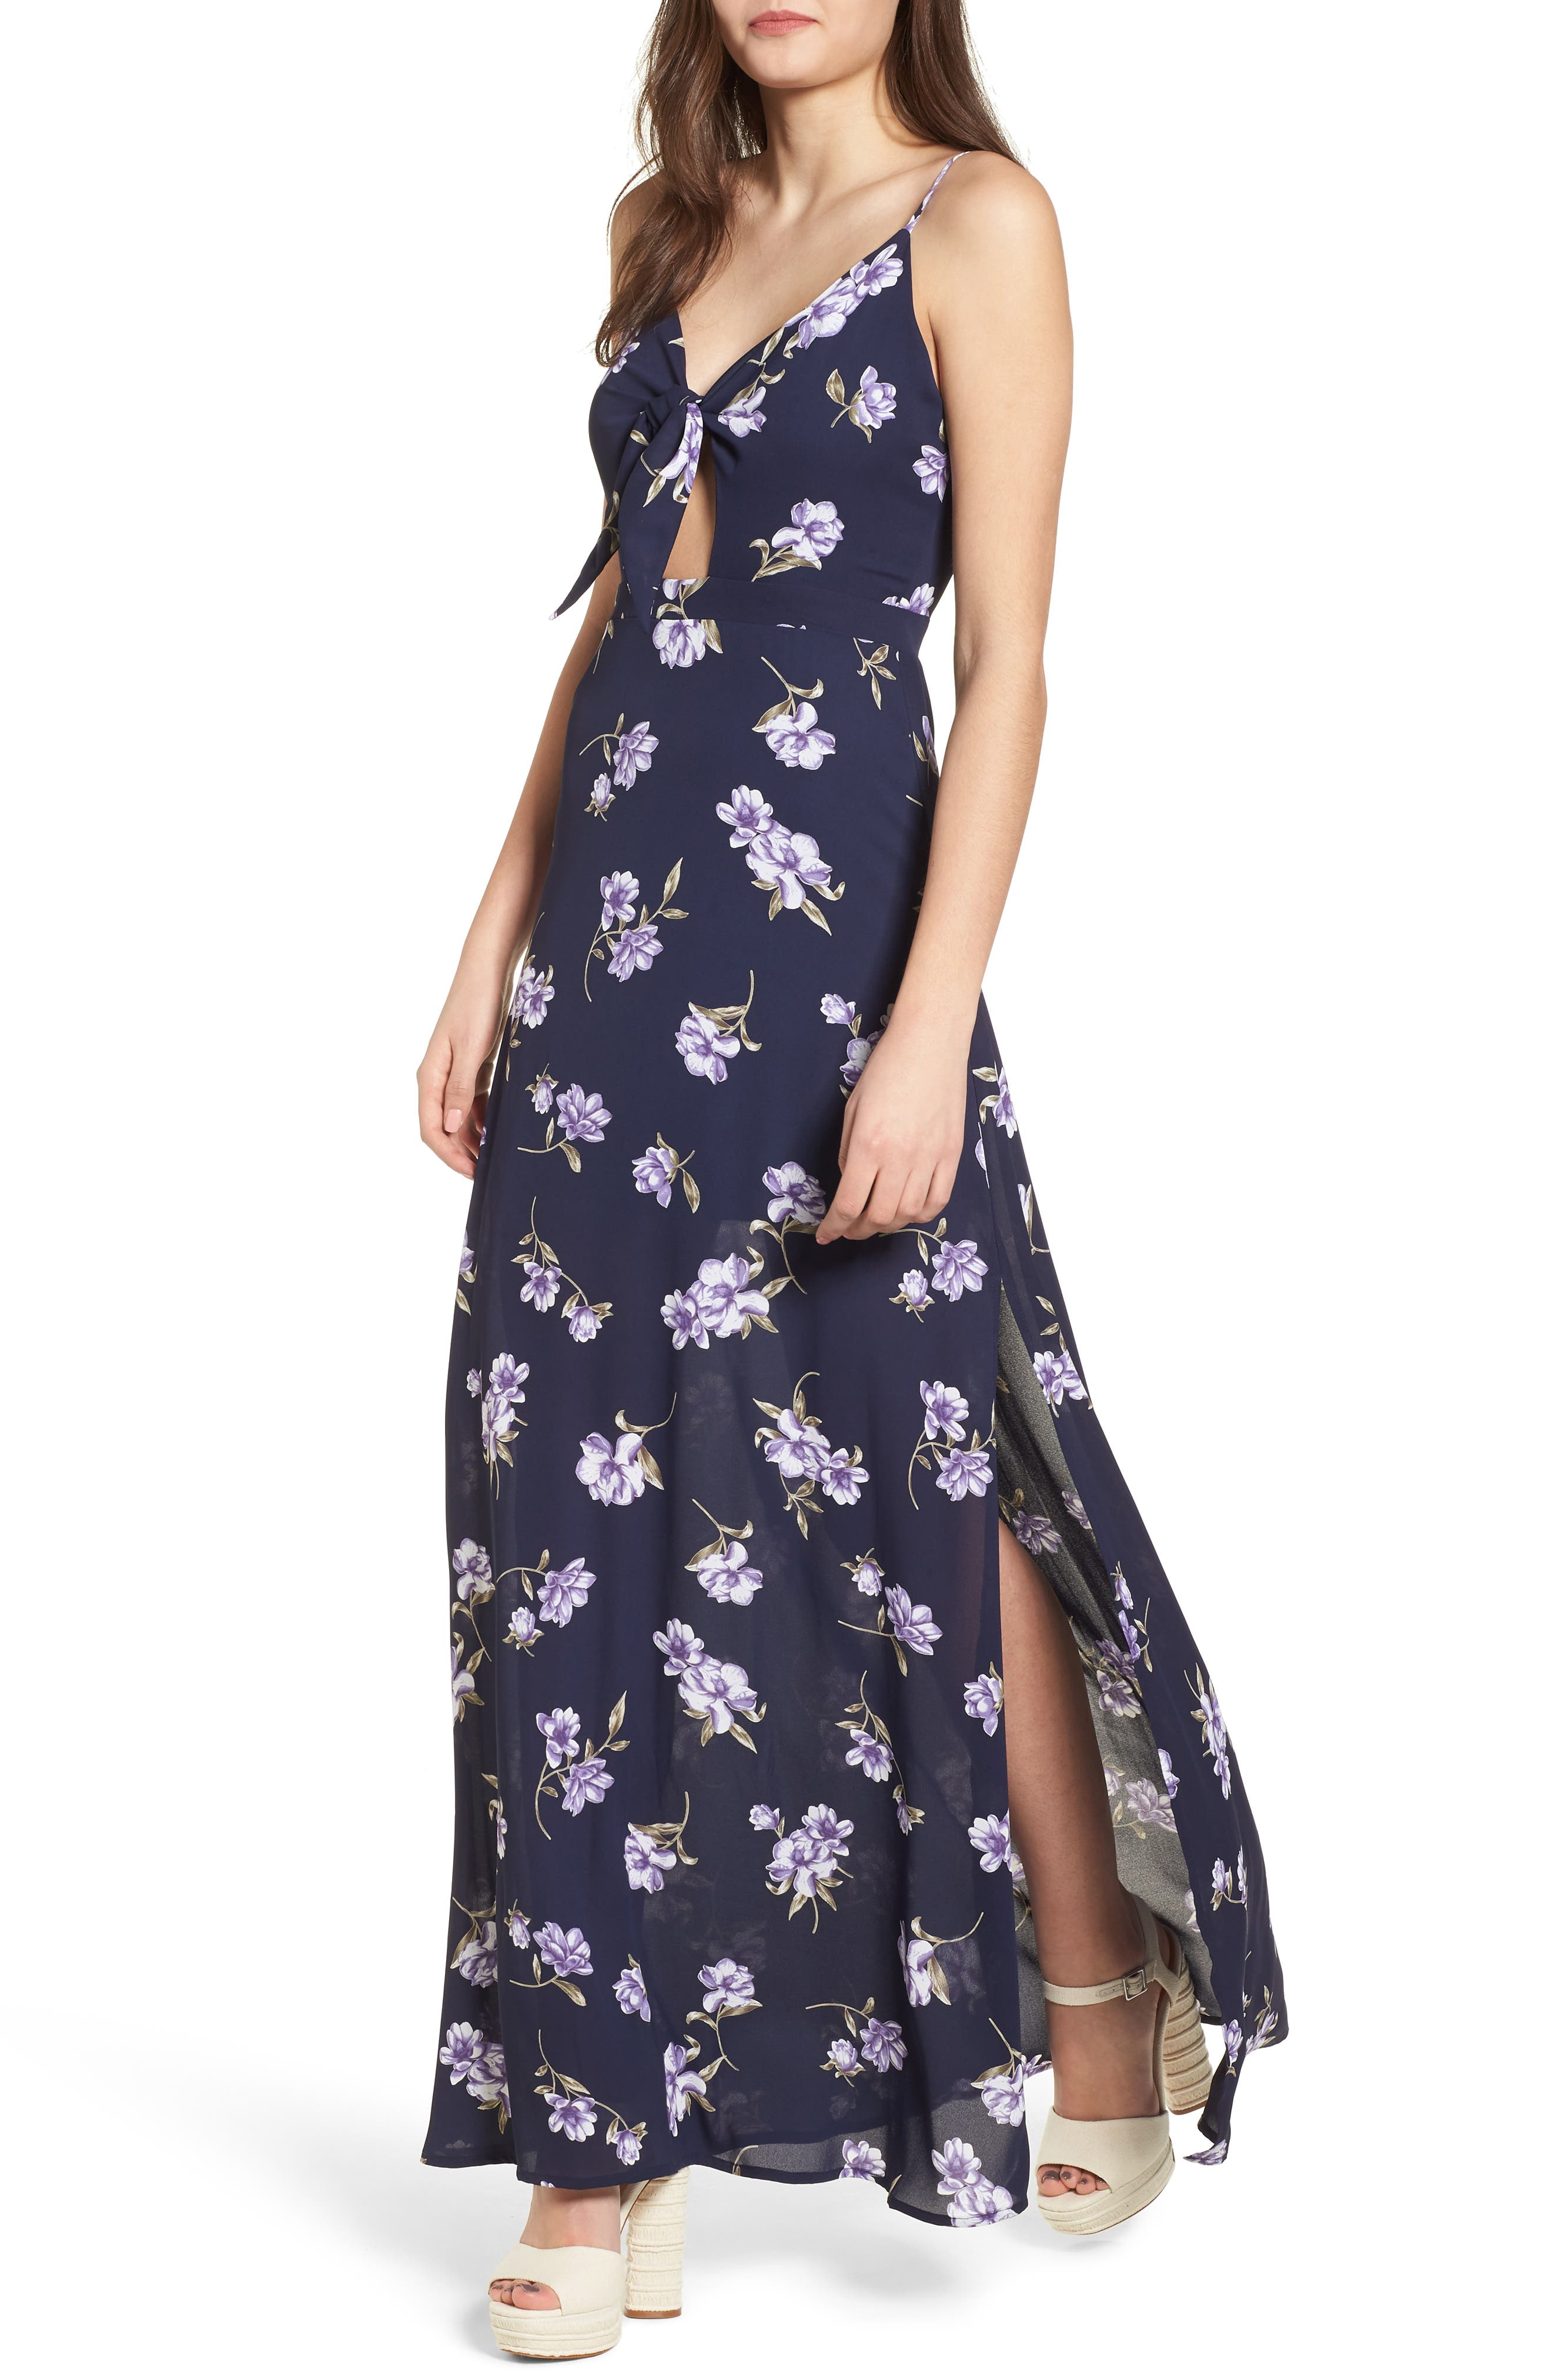 4SI3NNA Tie Front Maxi Dress